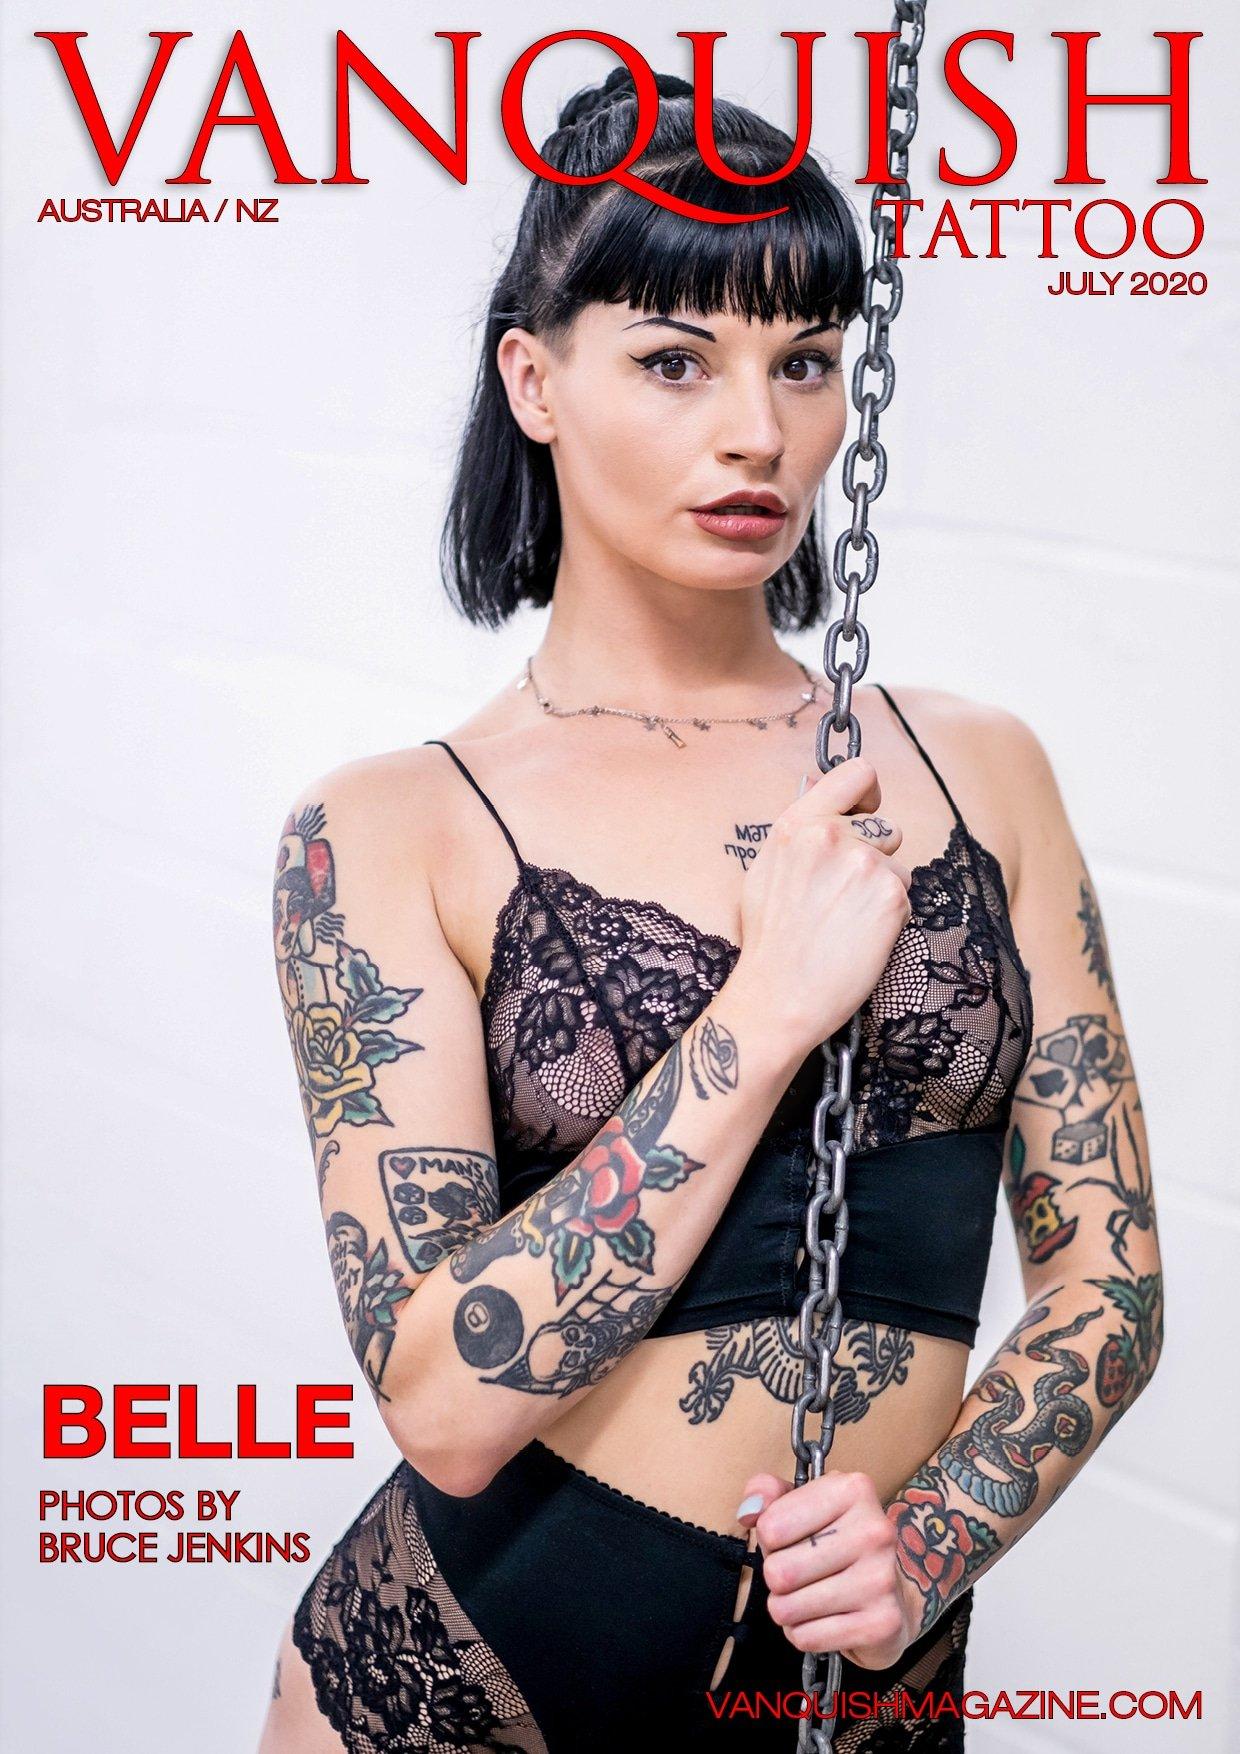 Vanquish Tattoo - July 2020 - Belle